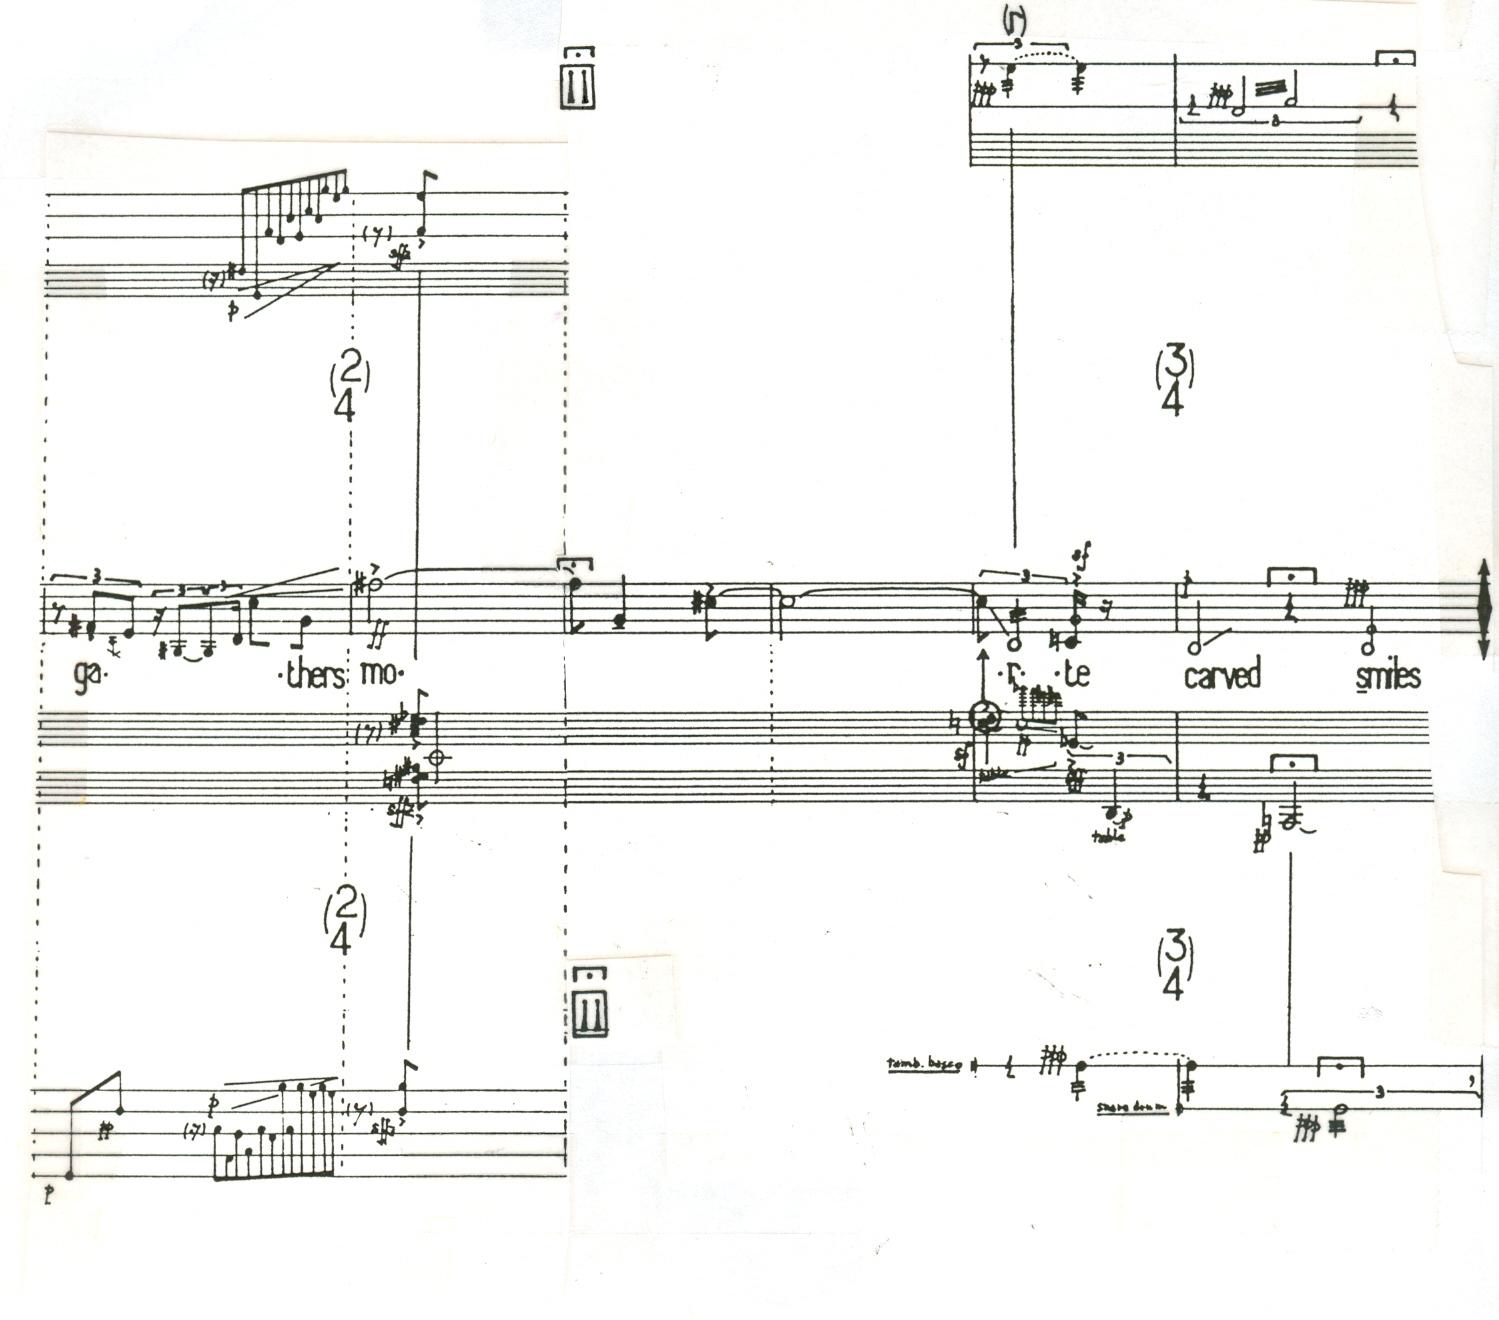 Luciano Berio Circles And Sequenzas